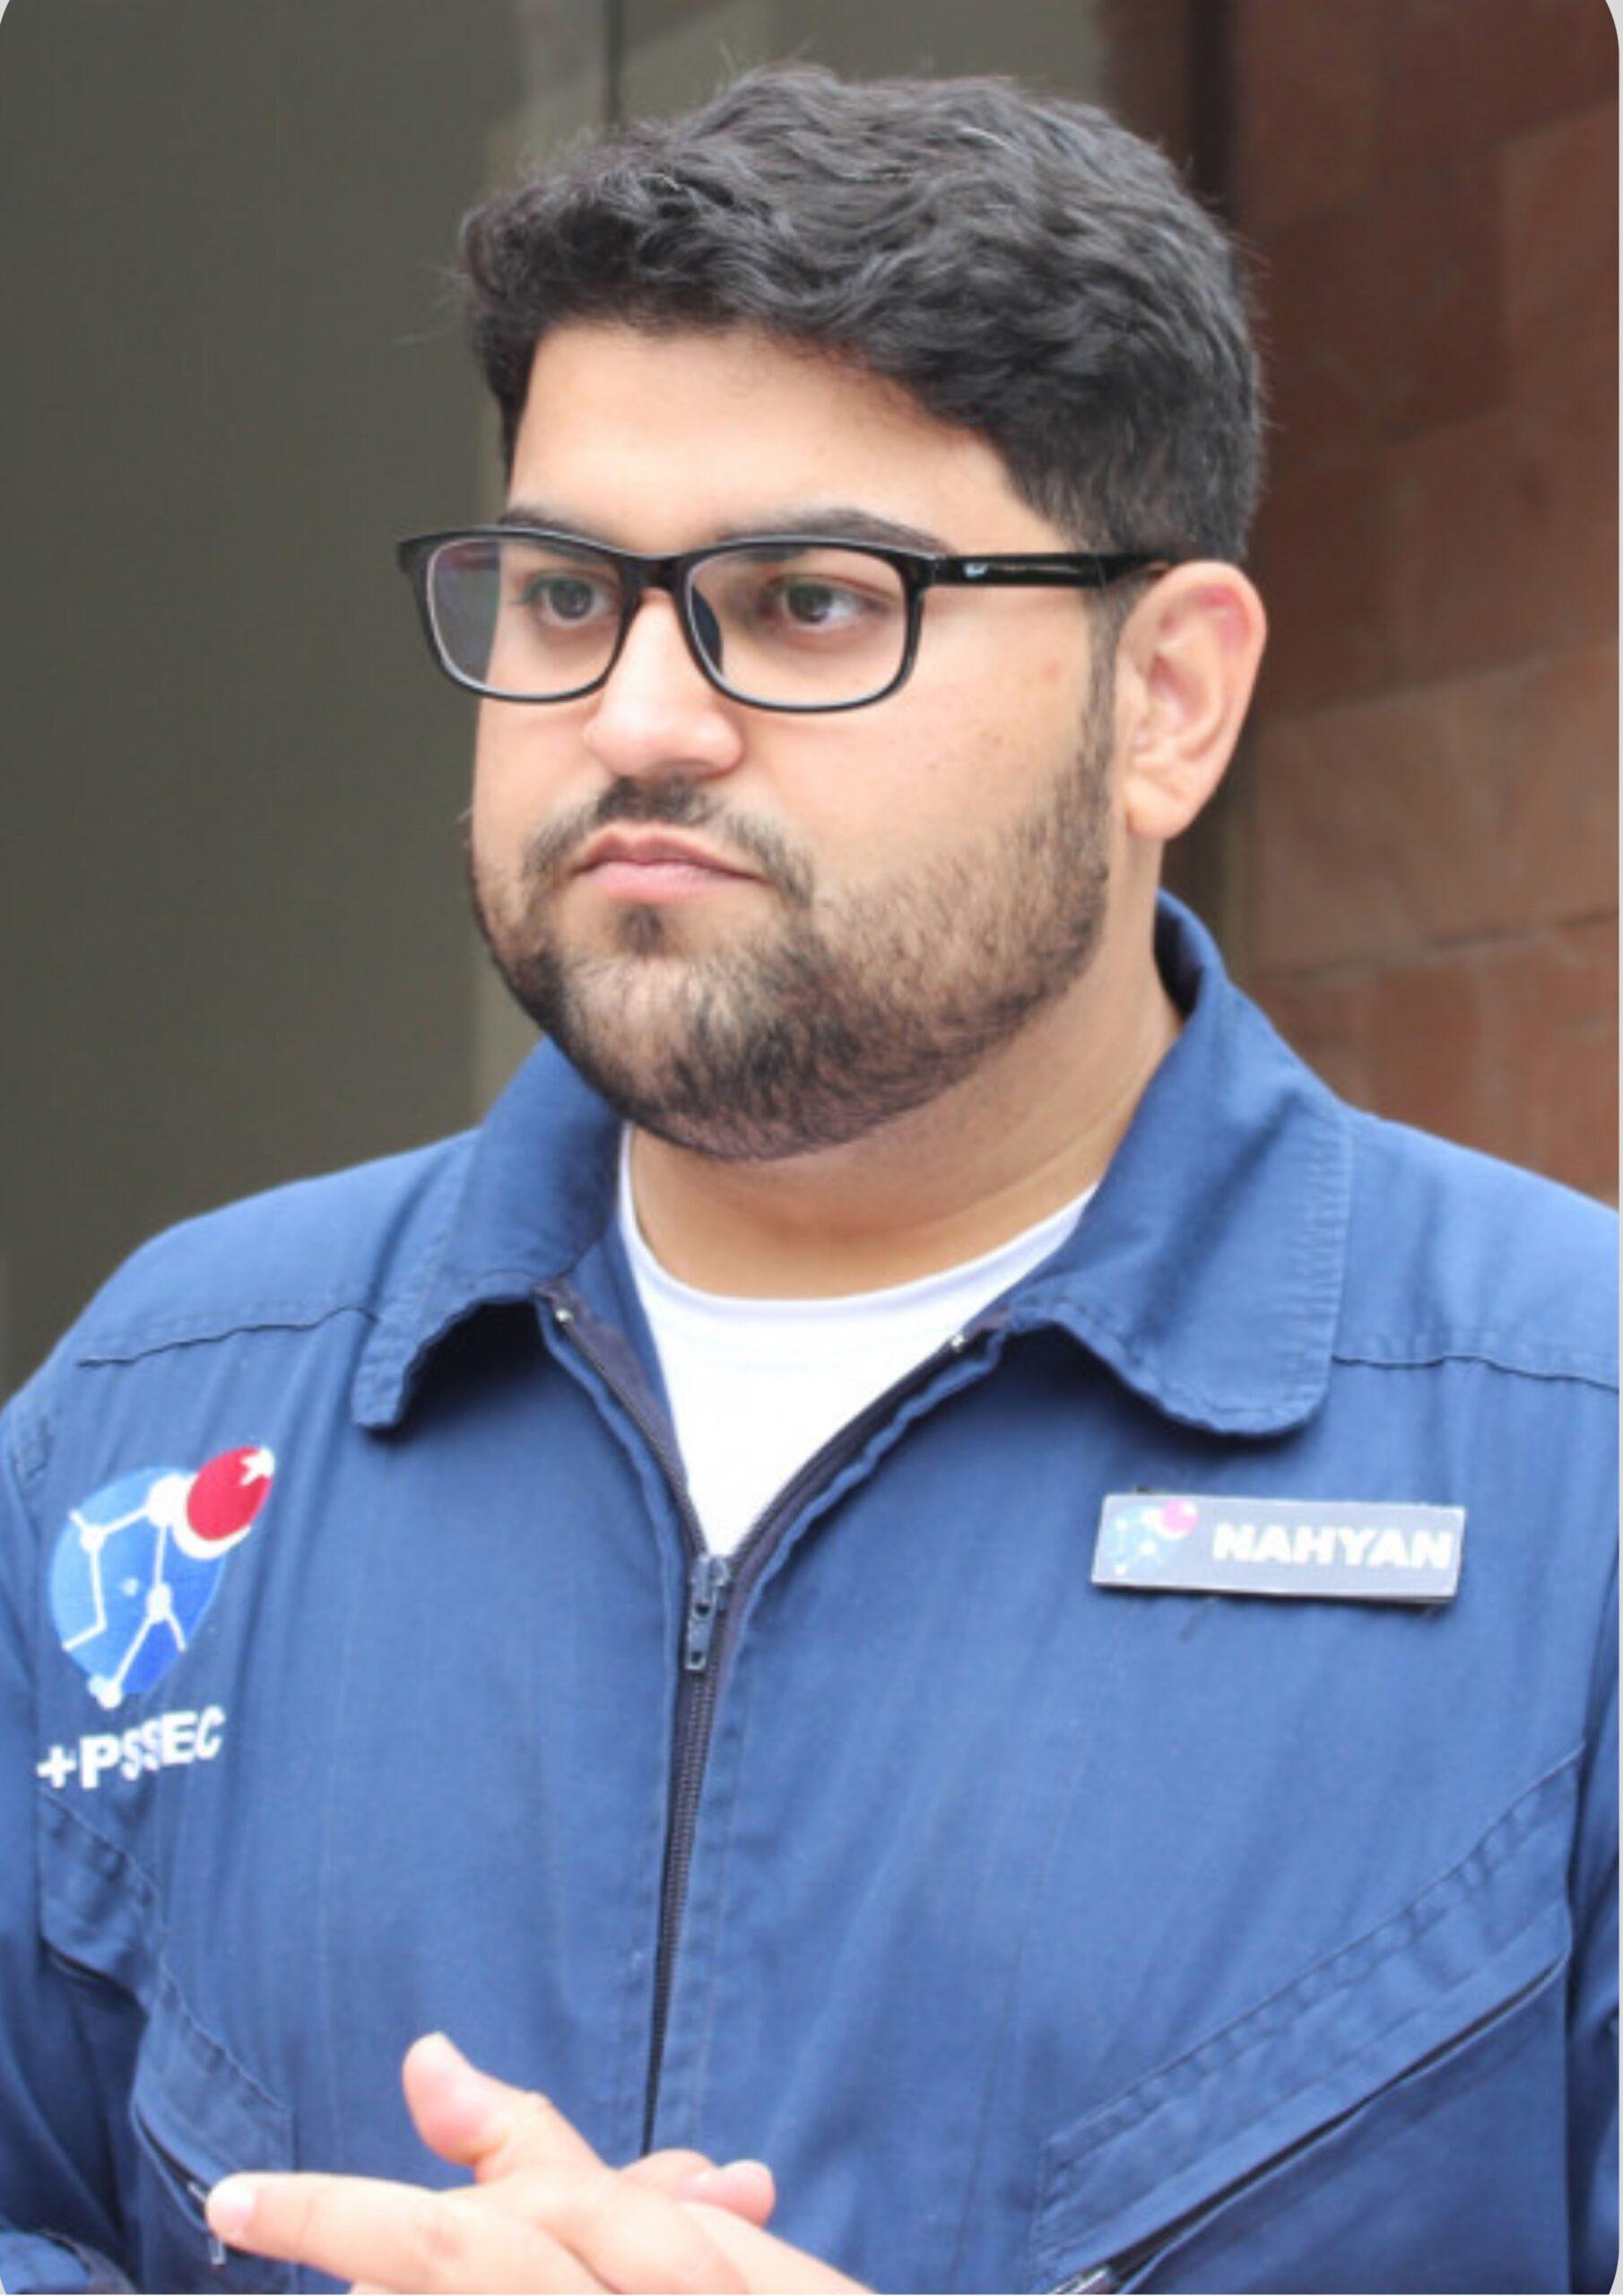 Mr. Nahyan Farooq